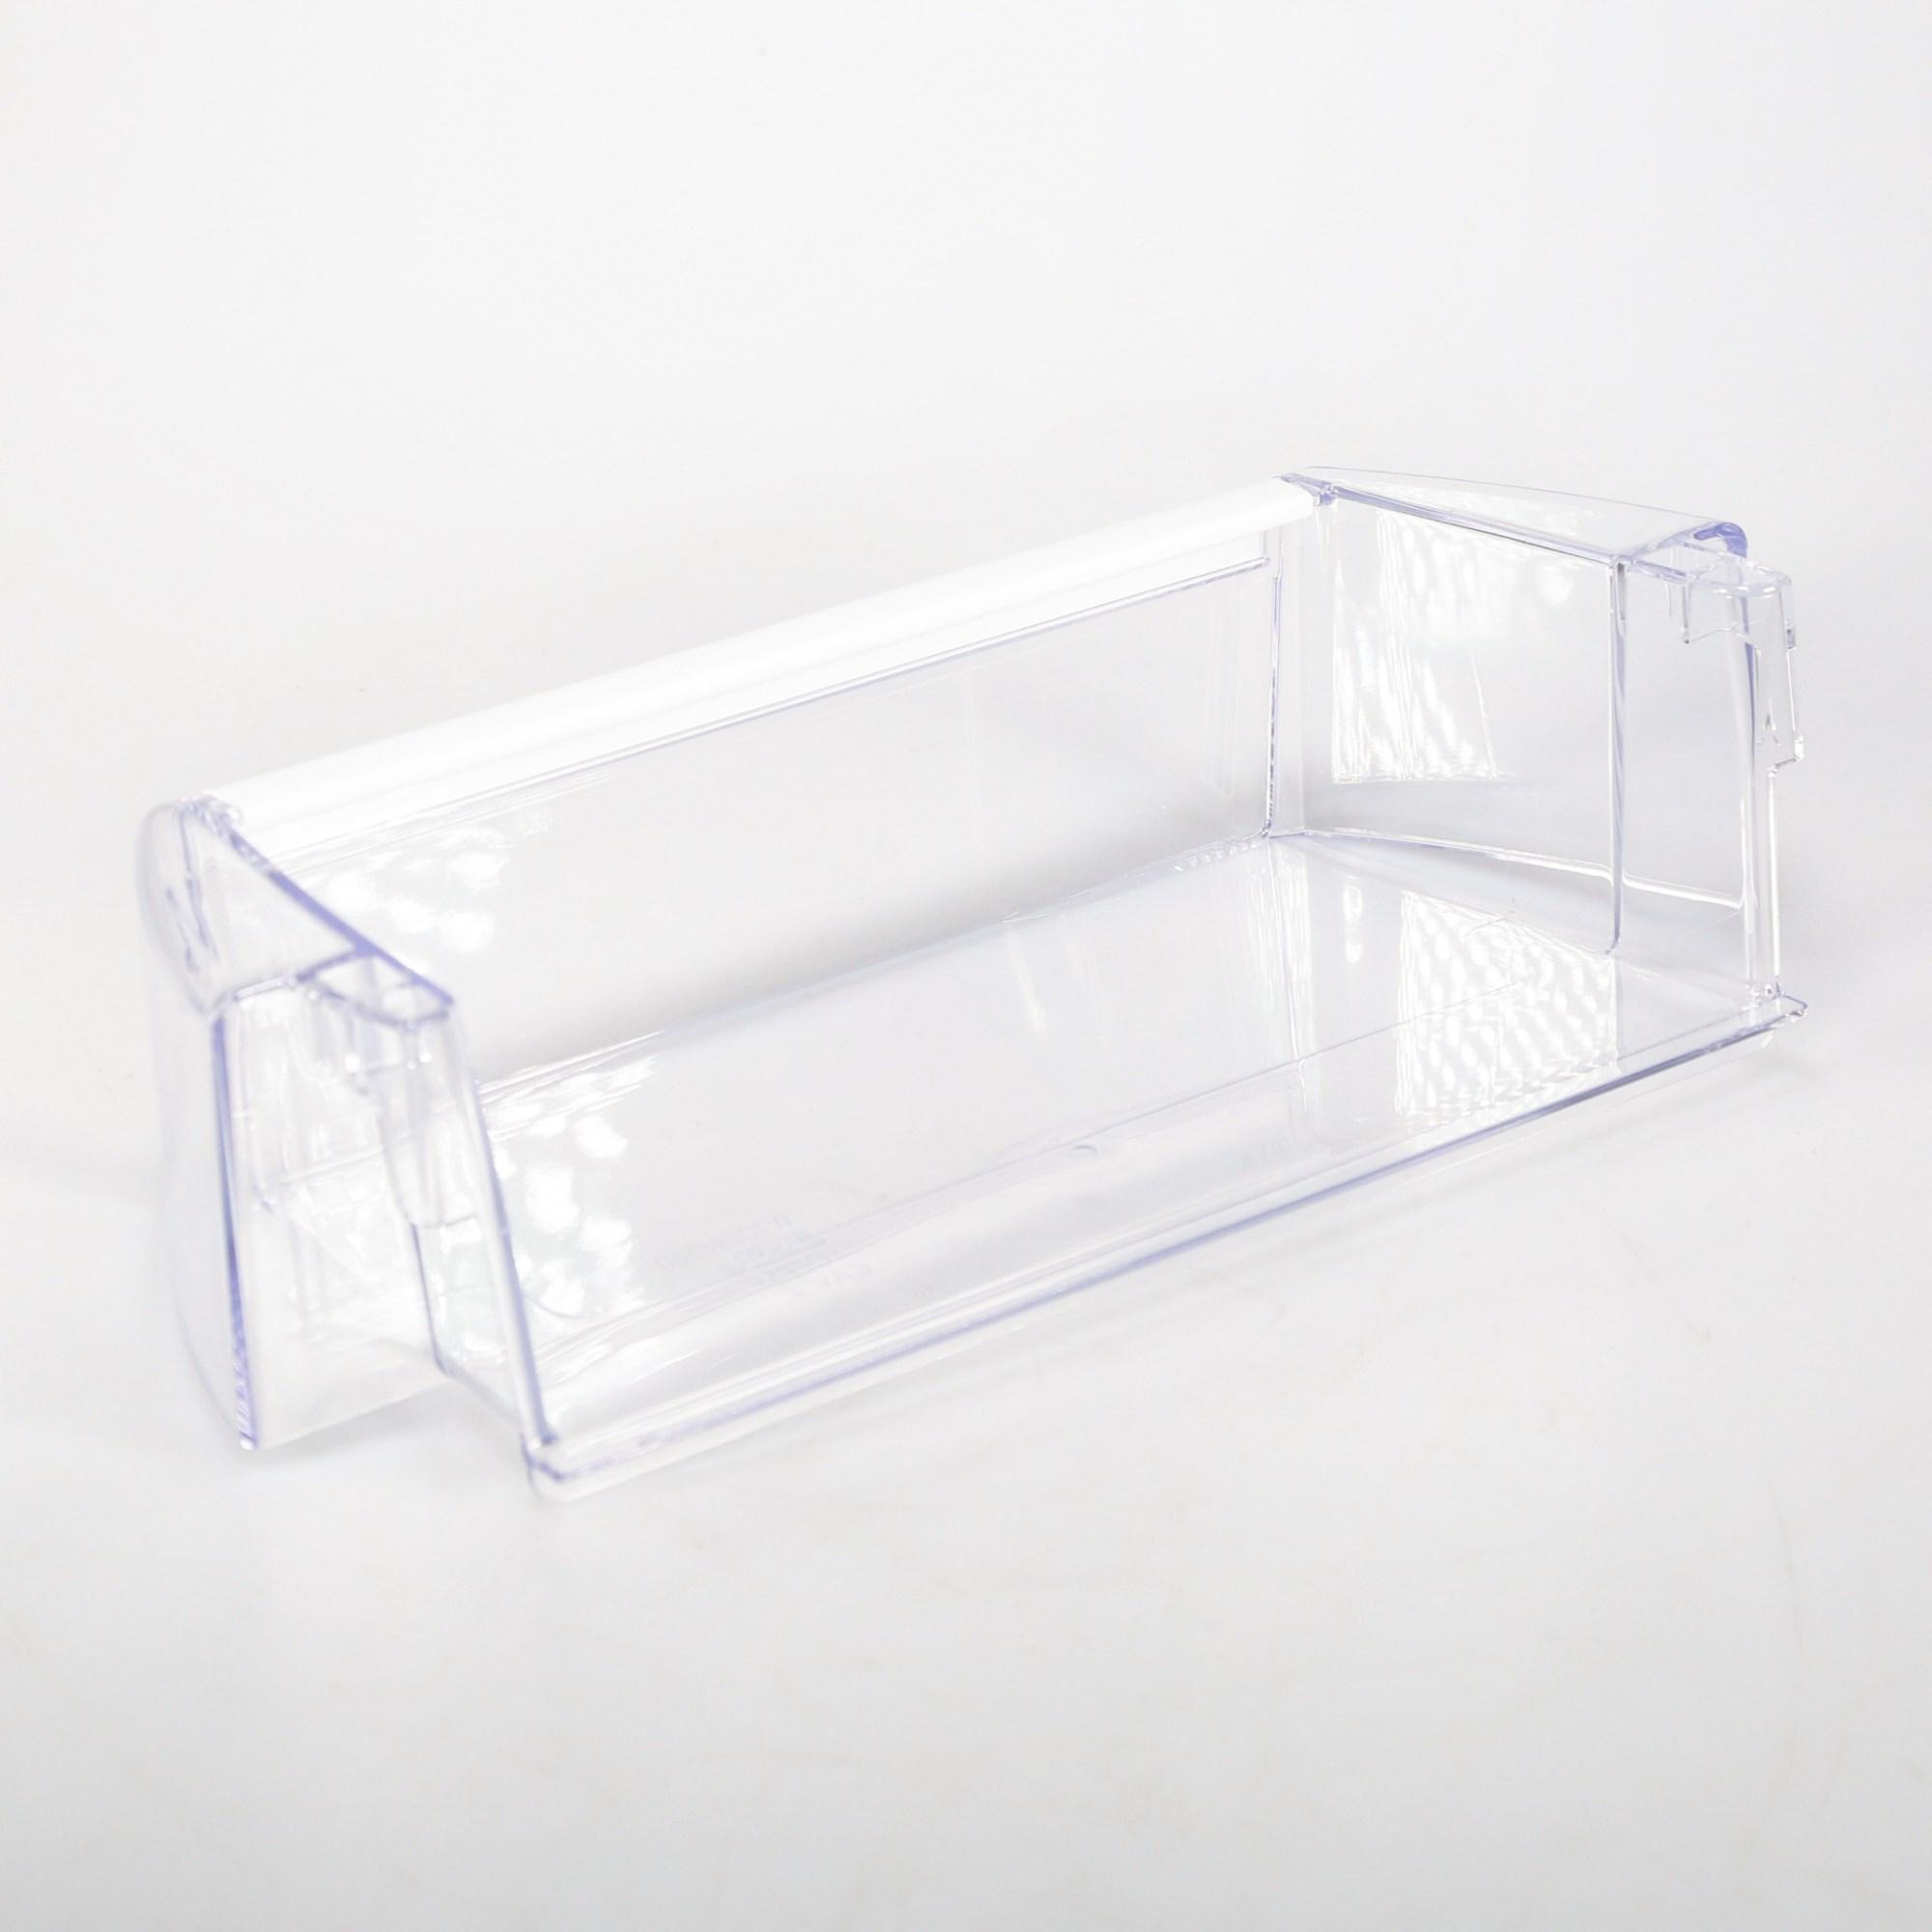 wpw10296857 whirlpool refrigerator door shelf bin ebay. Black Bedroom Furniture Sets. Home Design Ideas